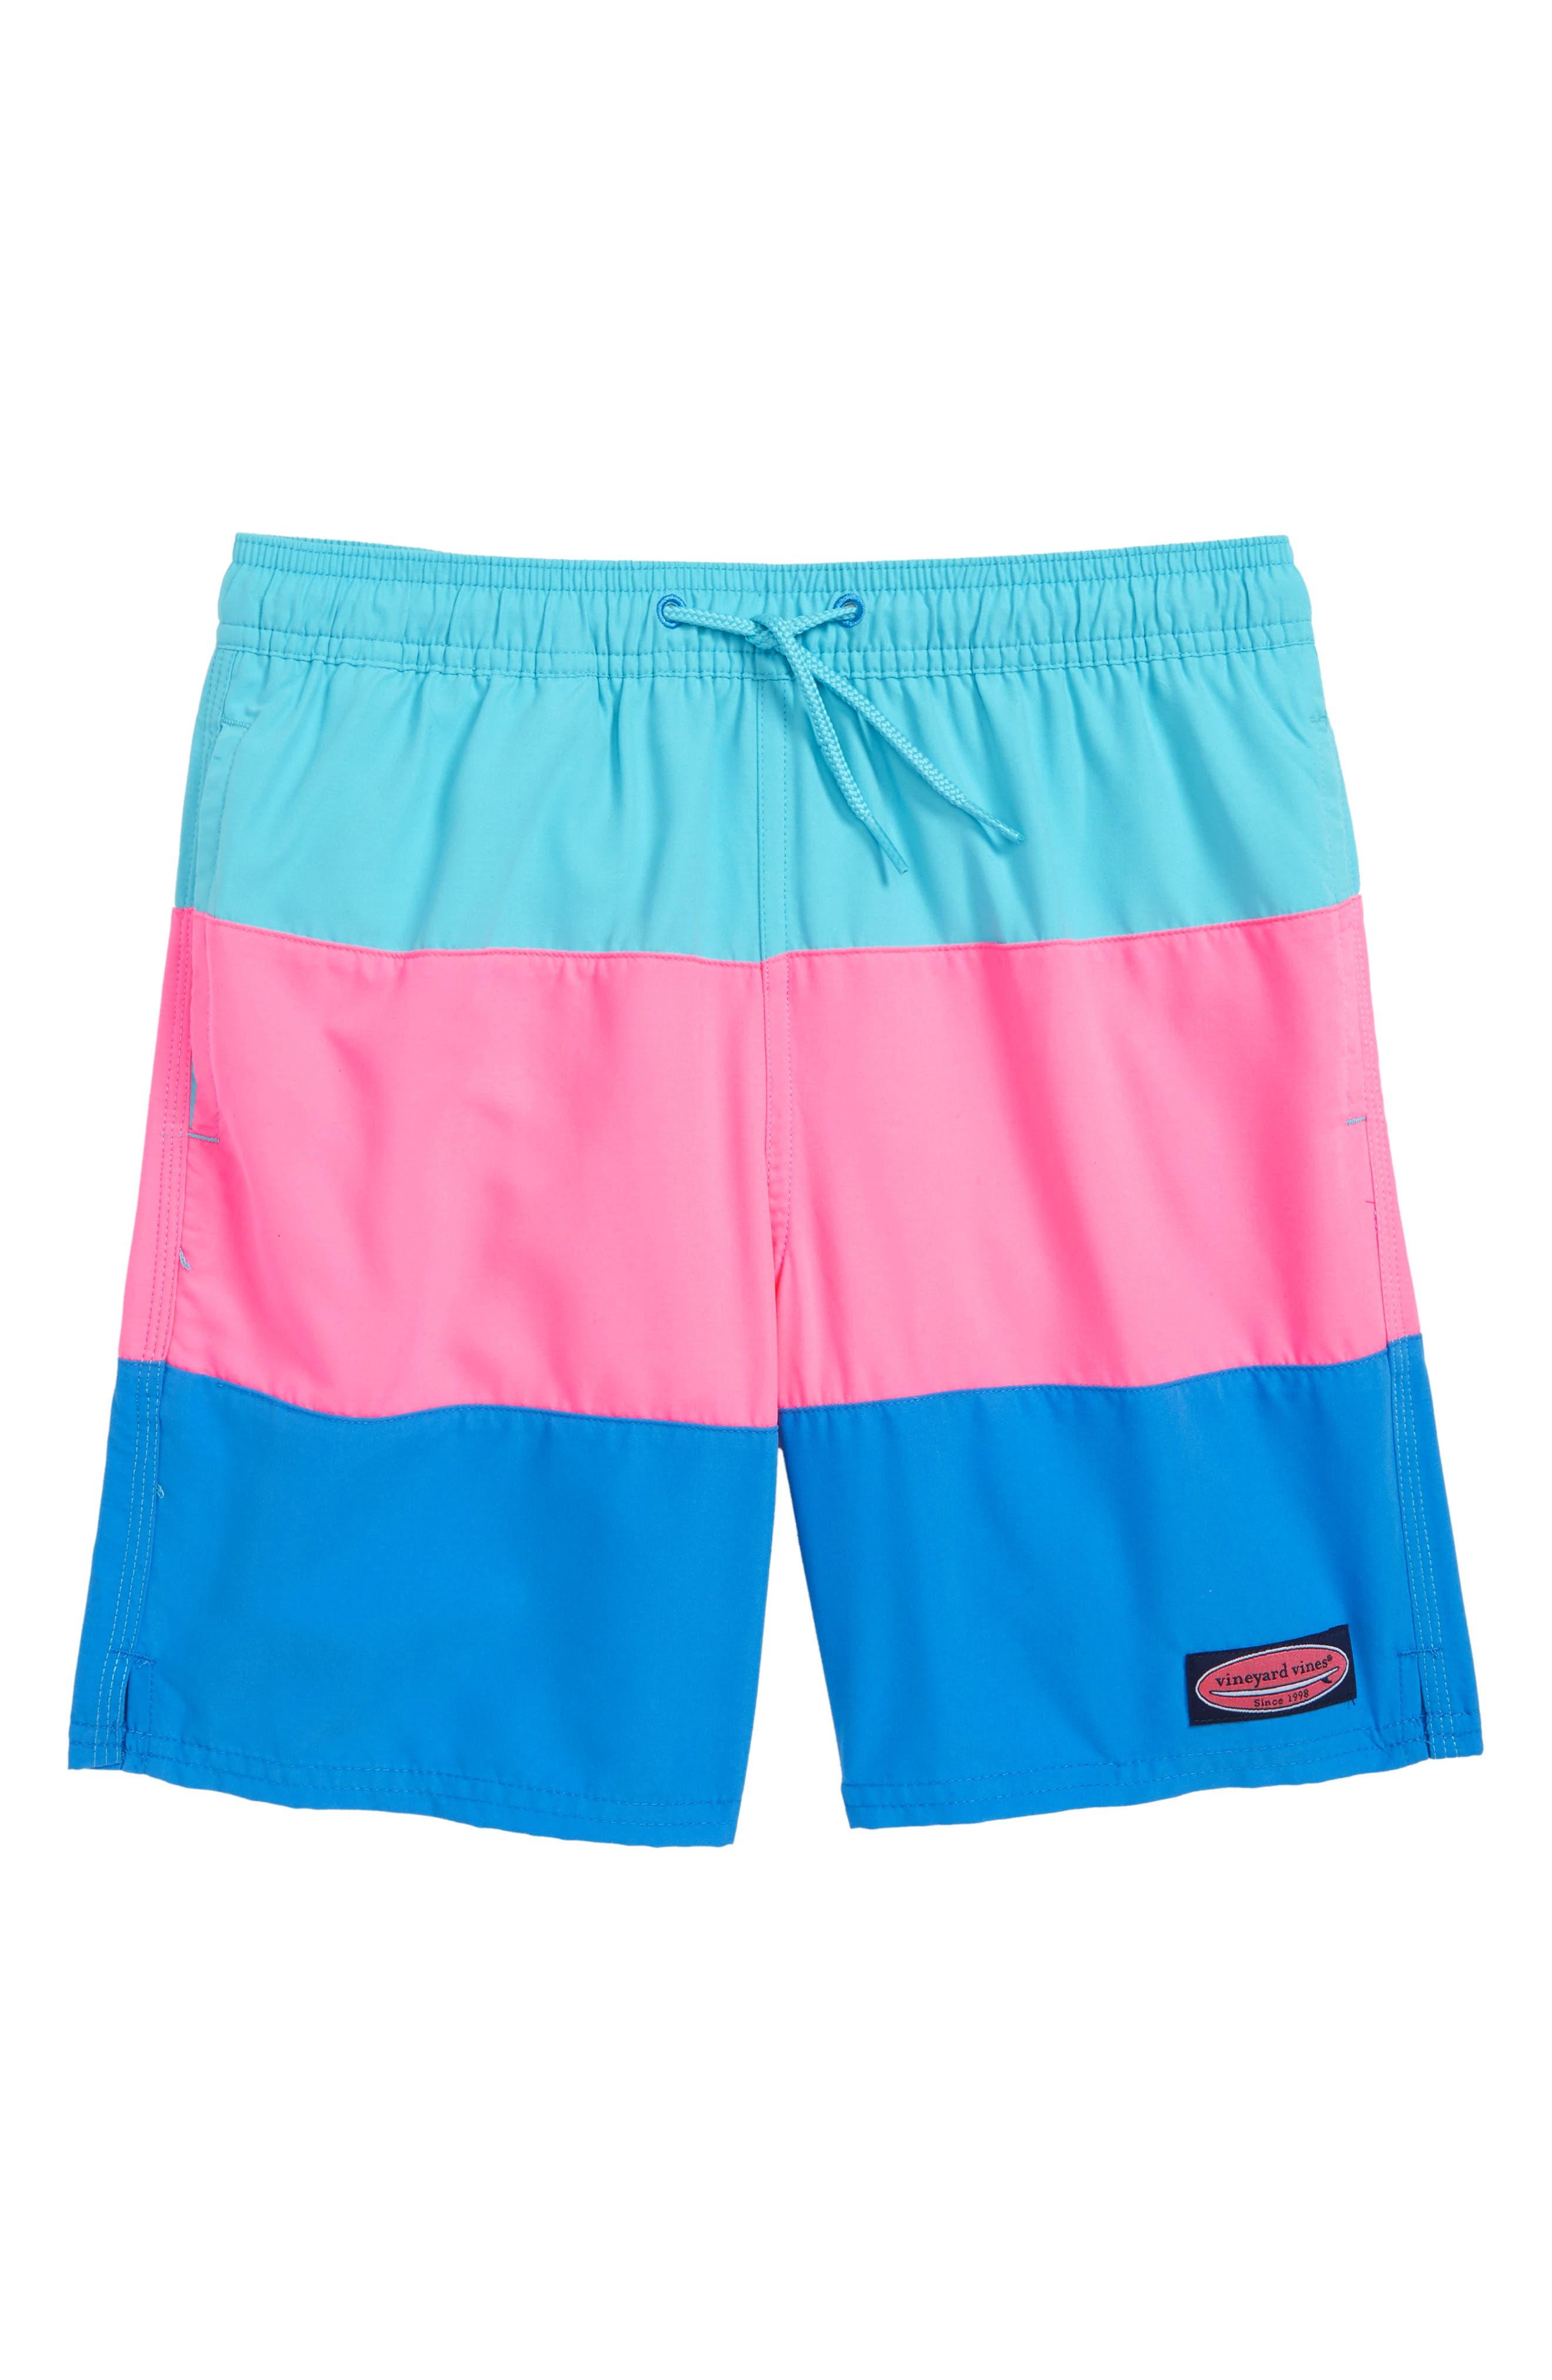 Chappy Pieced Rough Seas Swim Trunks,                         Main,                         color, Turqs